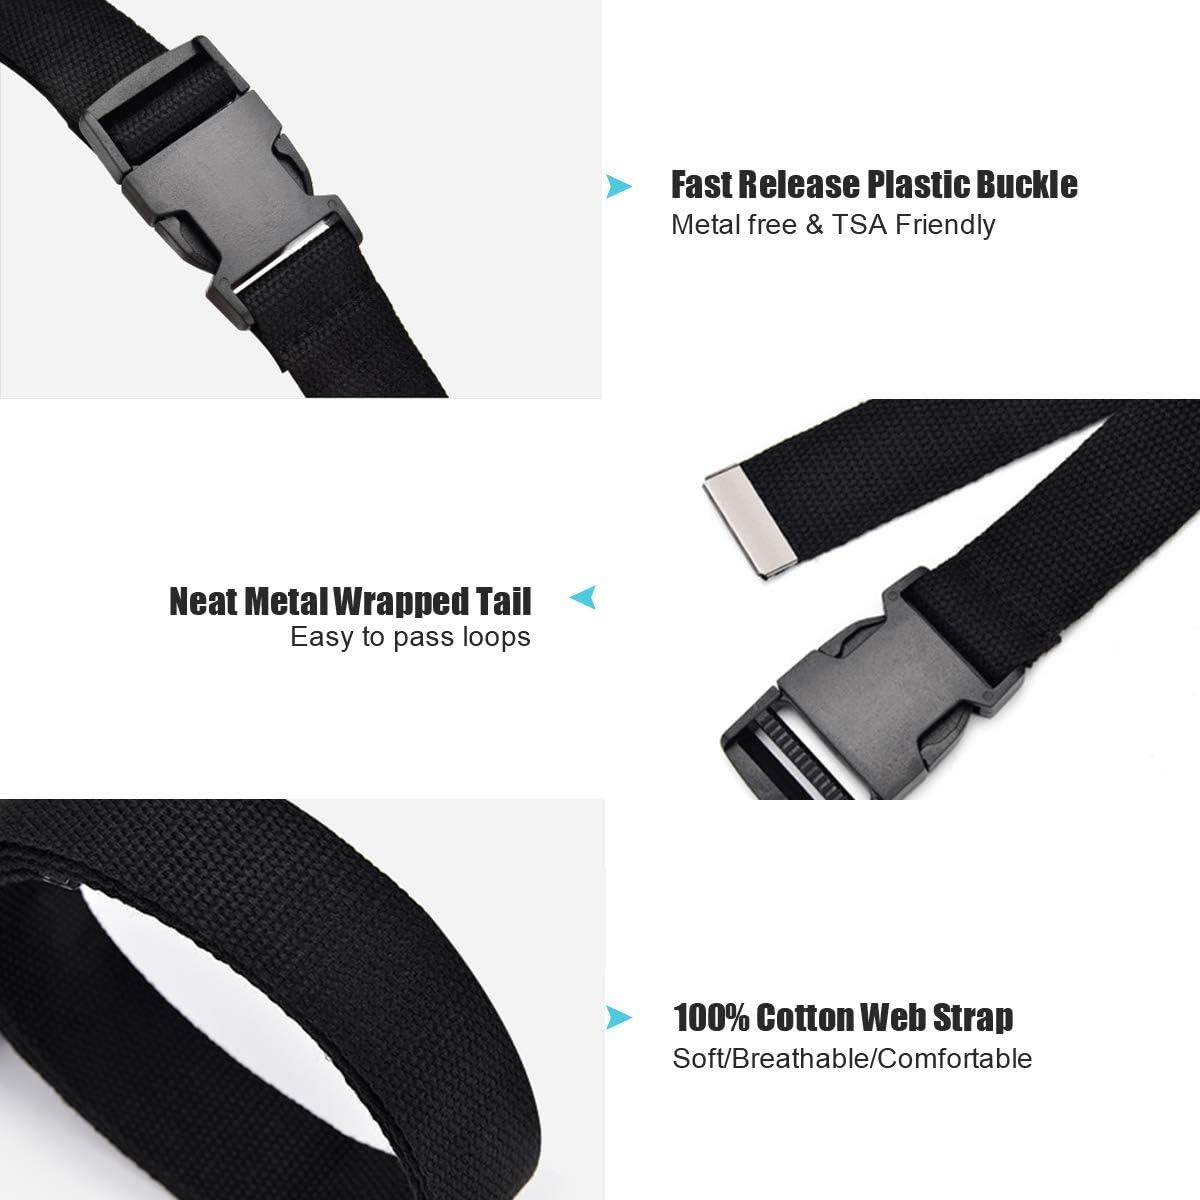 Cool Cargo Belt with Plastic Buckle XZQTIVE Canvas Web Belt for Women Hip Hop Streetwear Style Waist Belt for Dress